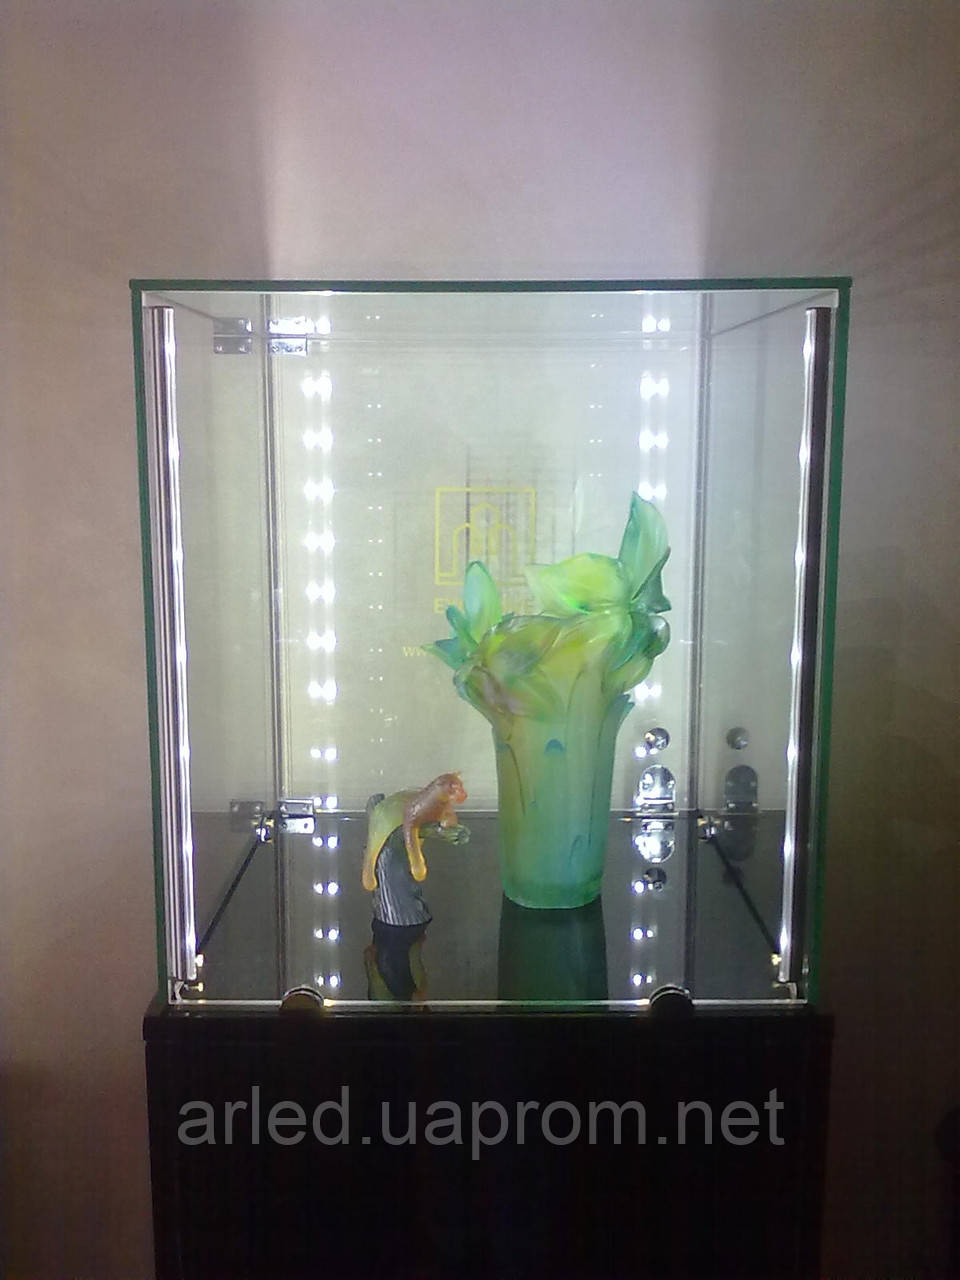 Светодиодная подсветка ODJ -  LED 16 Вт. A++ для витрин